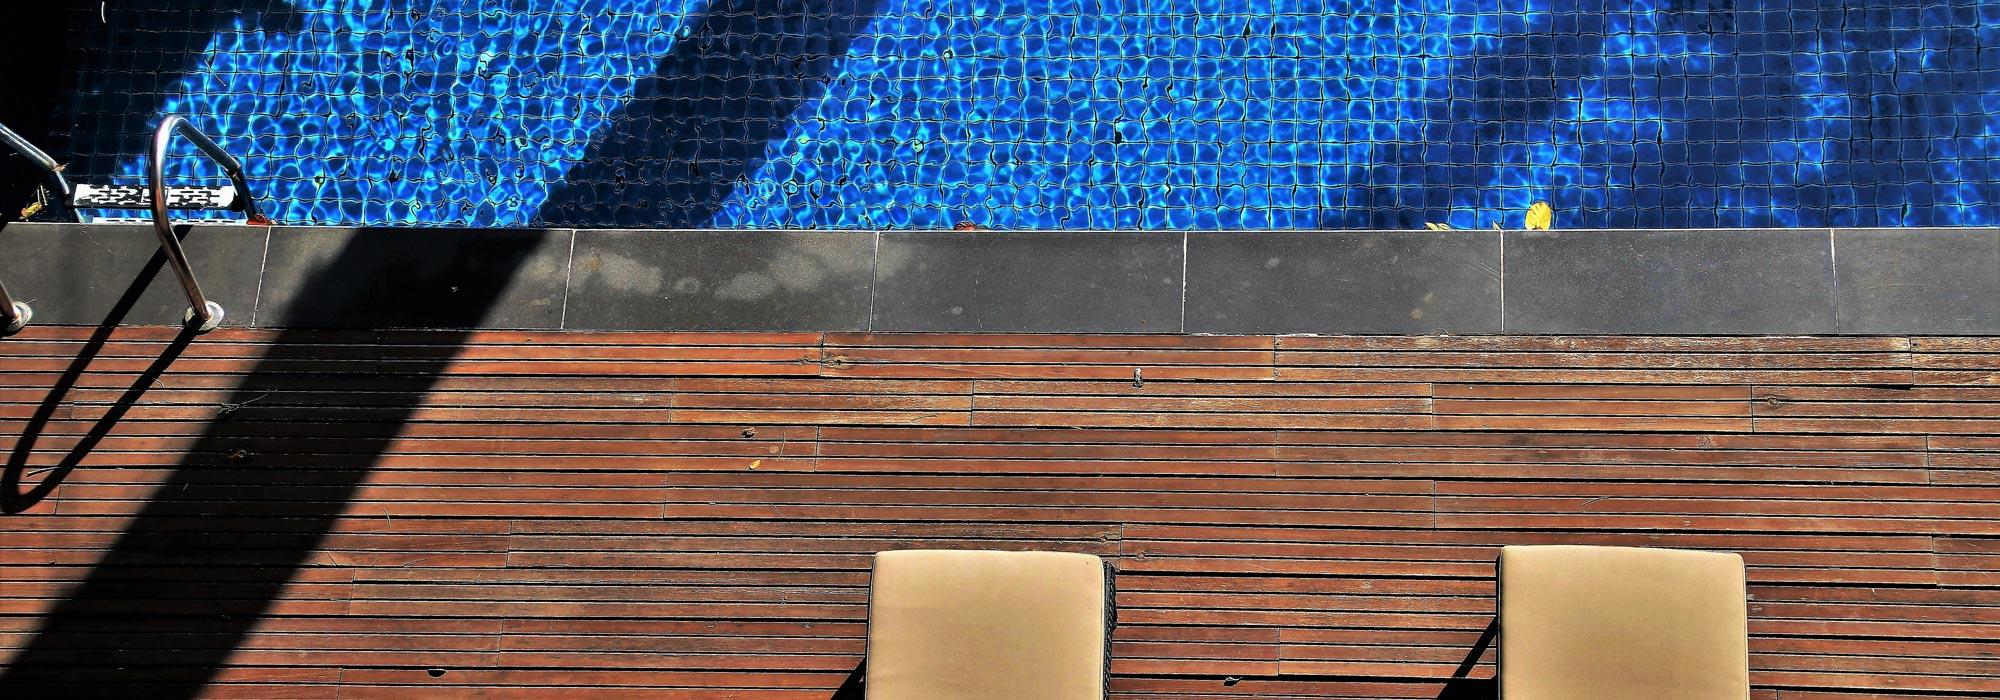 Günstige Hotels in Dubai